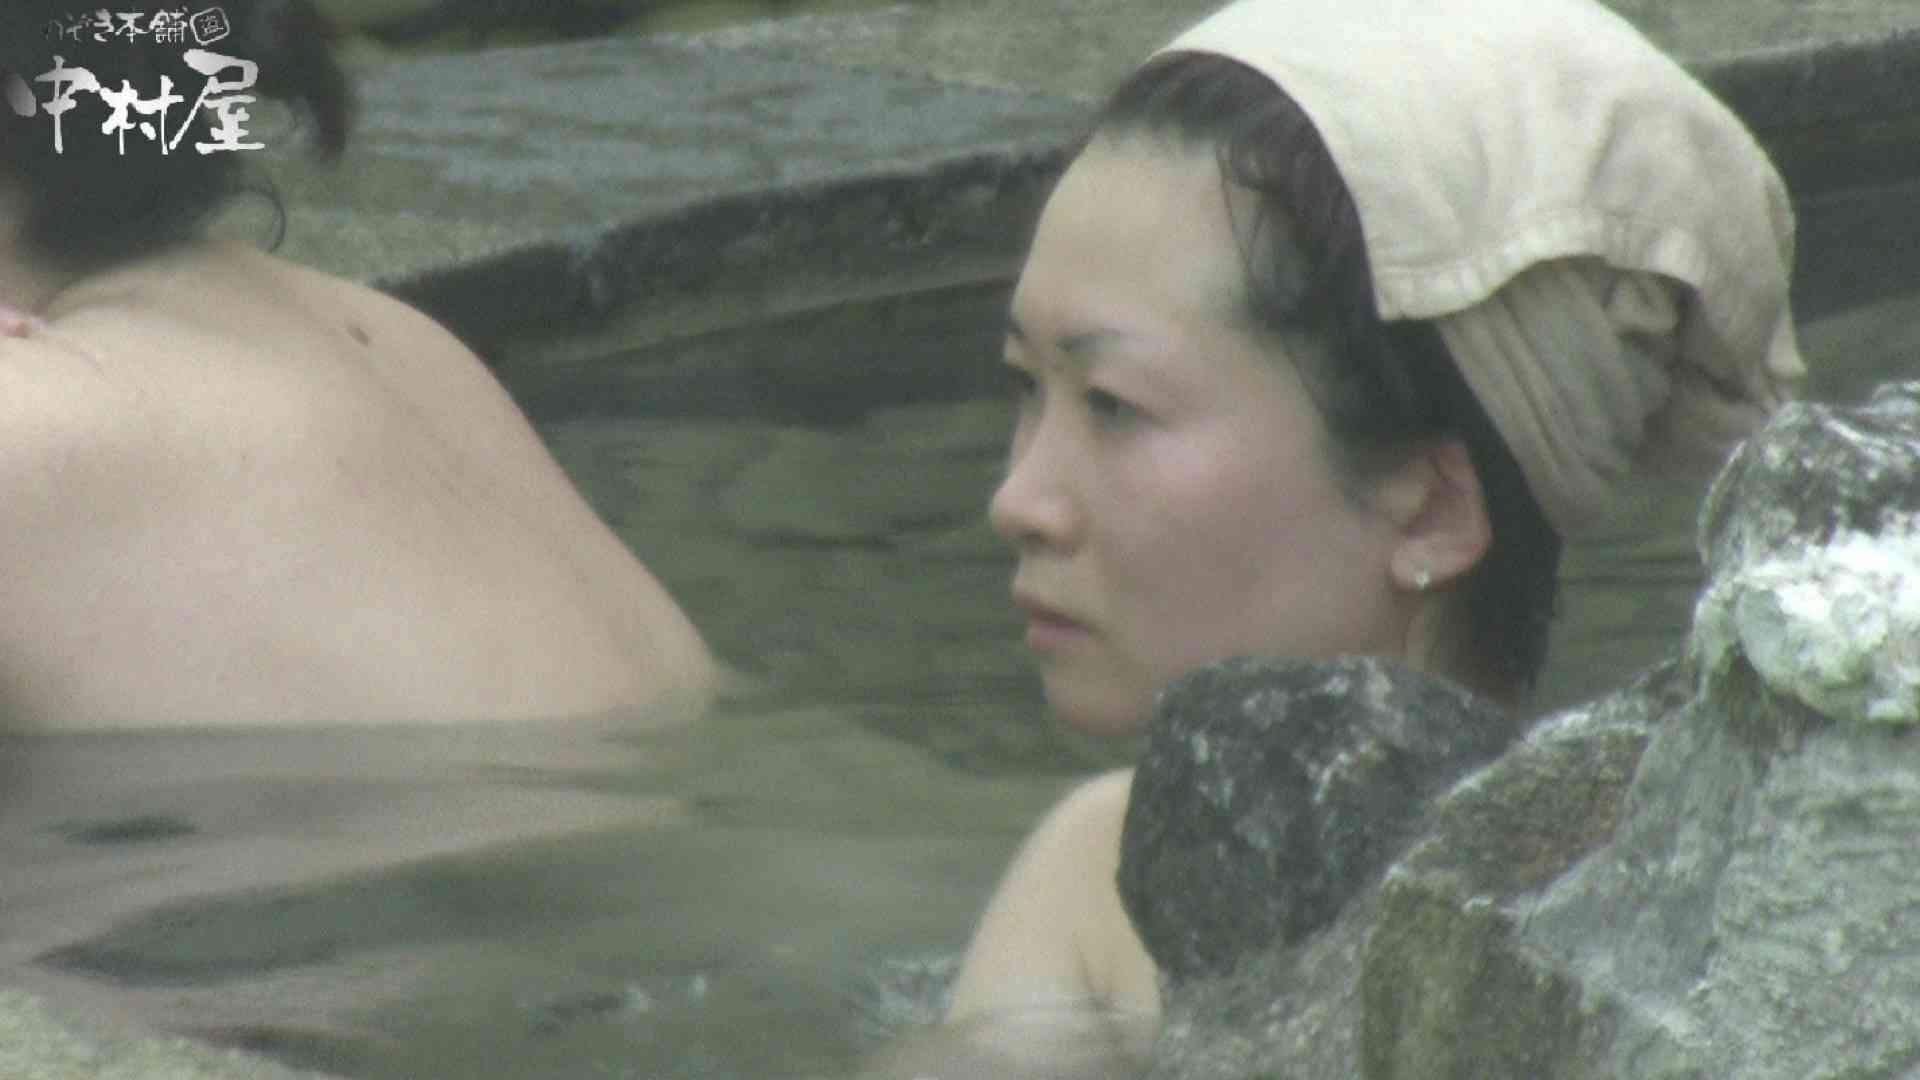 Aquaな露天風呂Vol.906 露天風呂編  86PIX 78